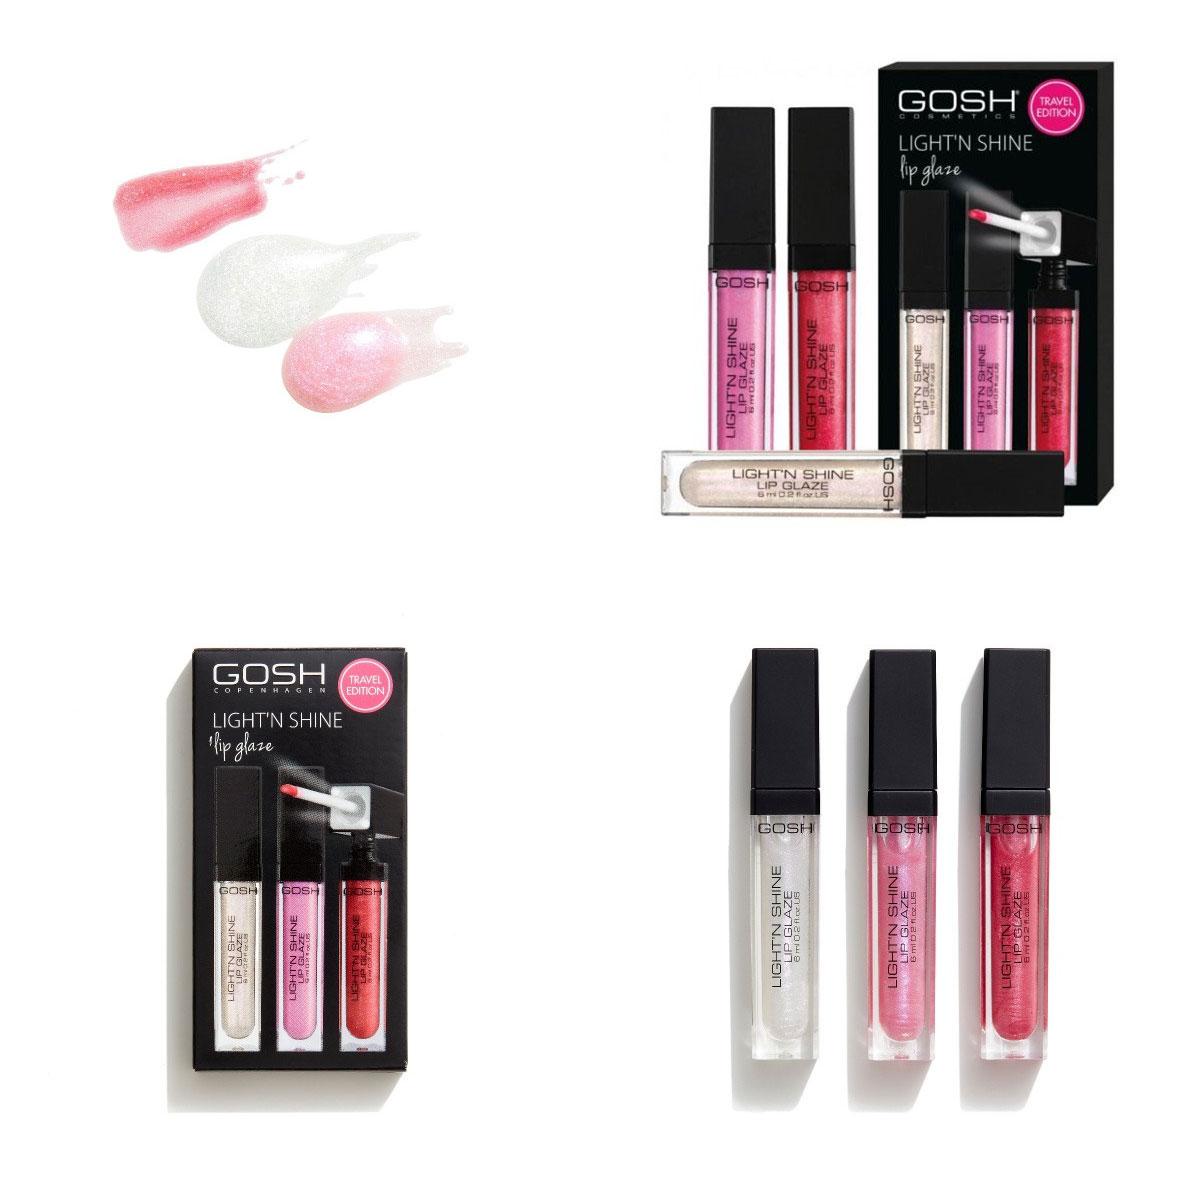 GOSH - Beauty Kit 3x Ligh't N' Shine lipgloss + meer GOSH aanbiedingen tot -71% !!